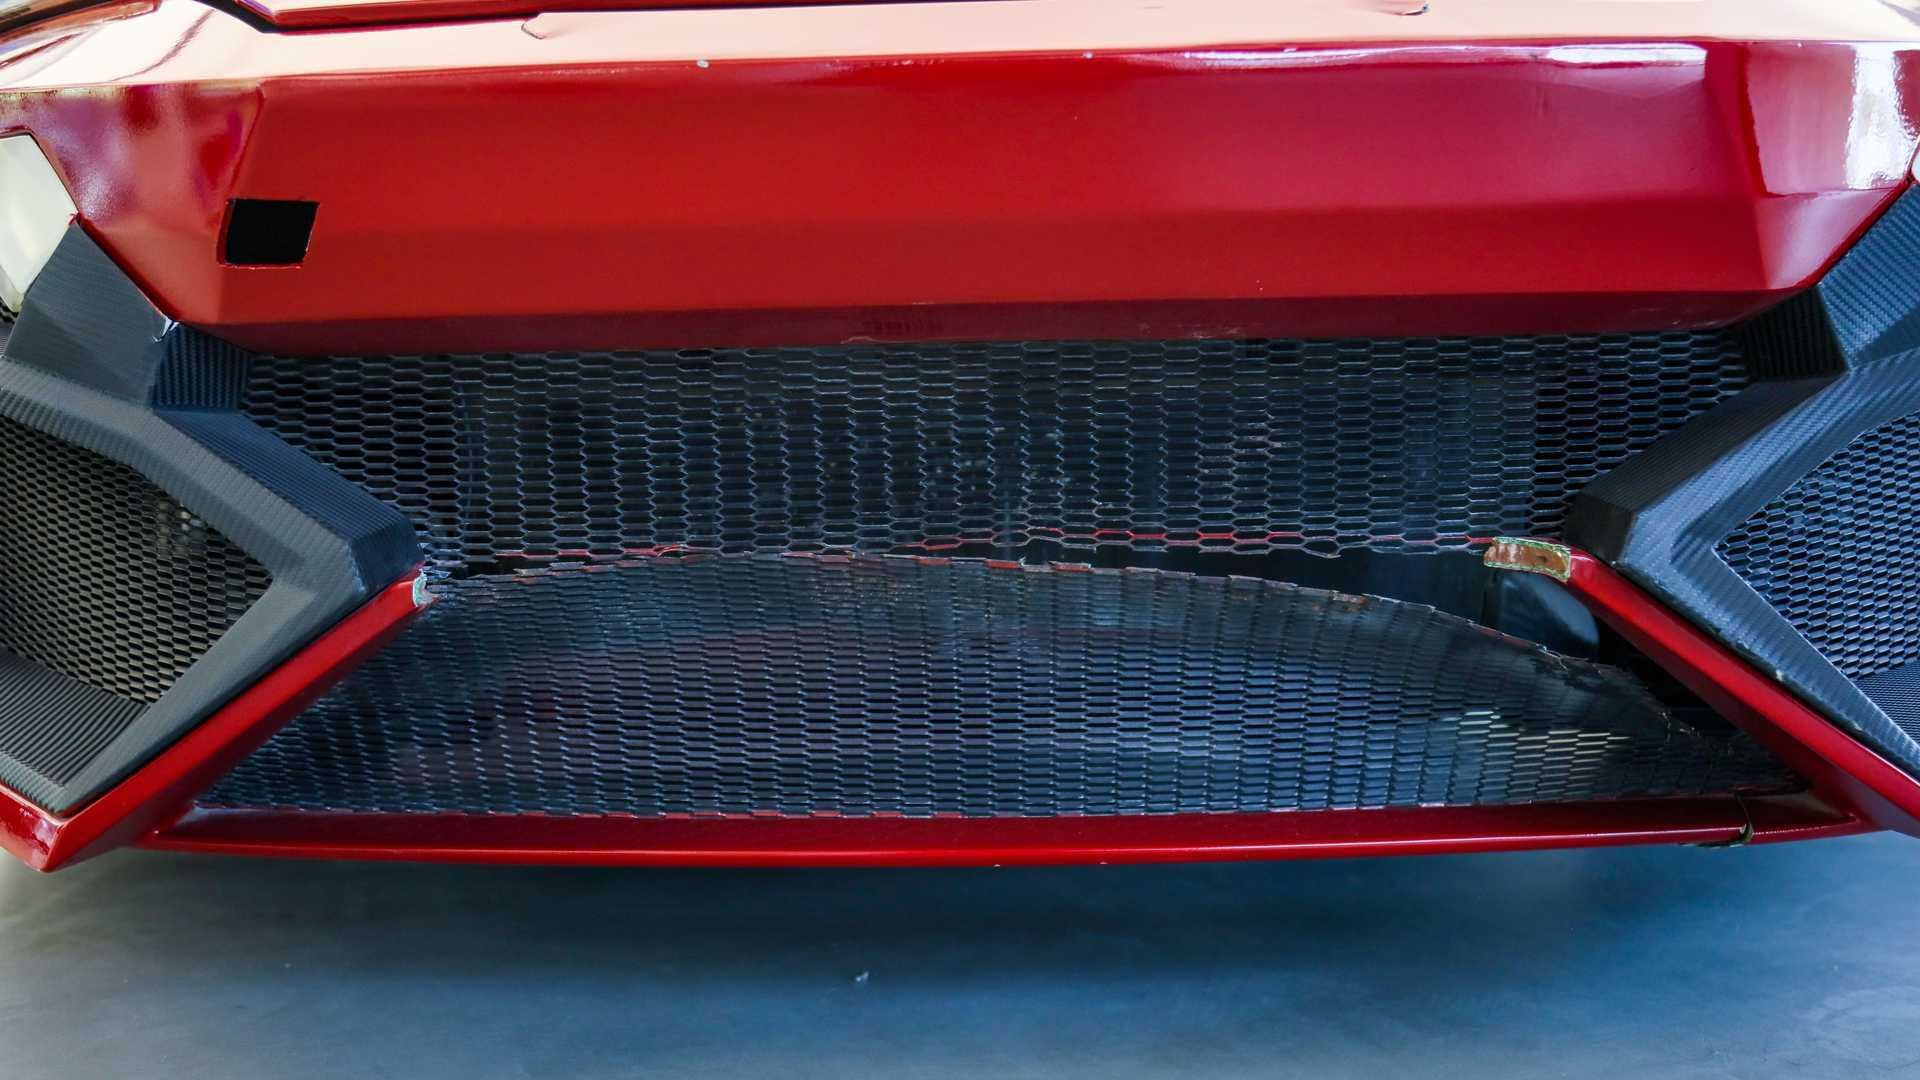 Lykan_HyperSport_stunt_car_sale-0018